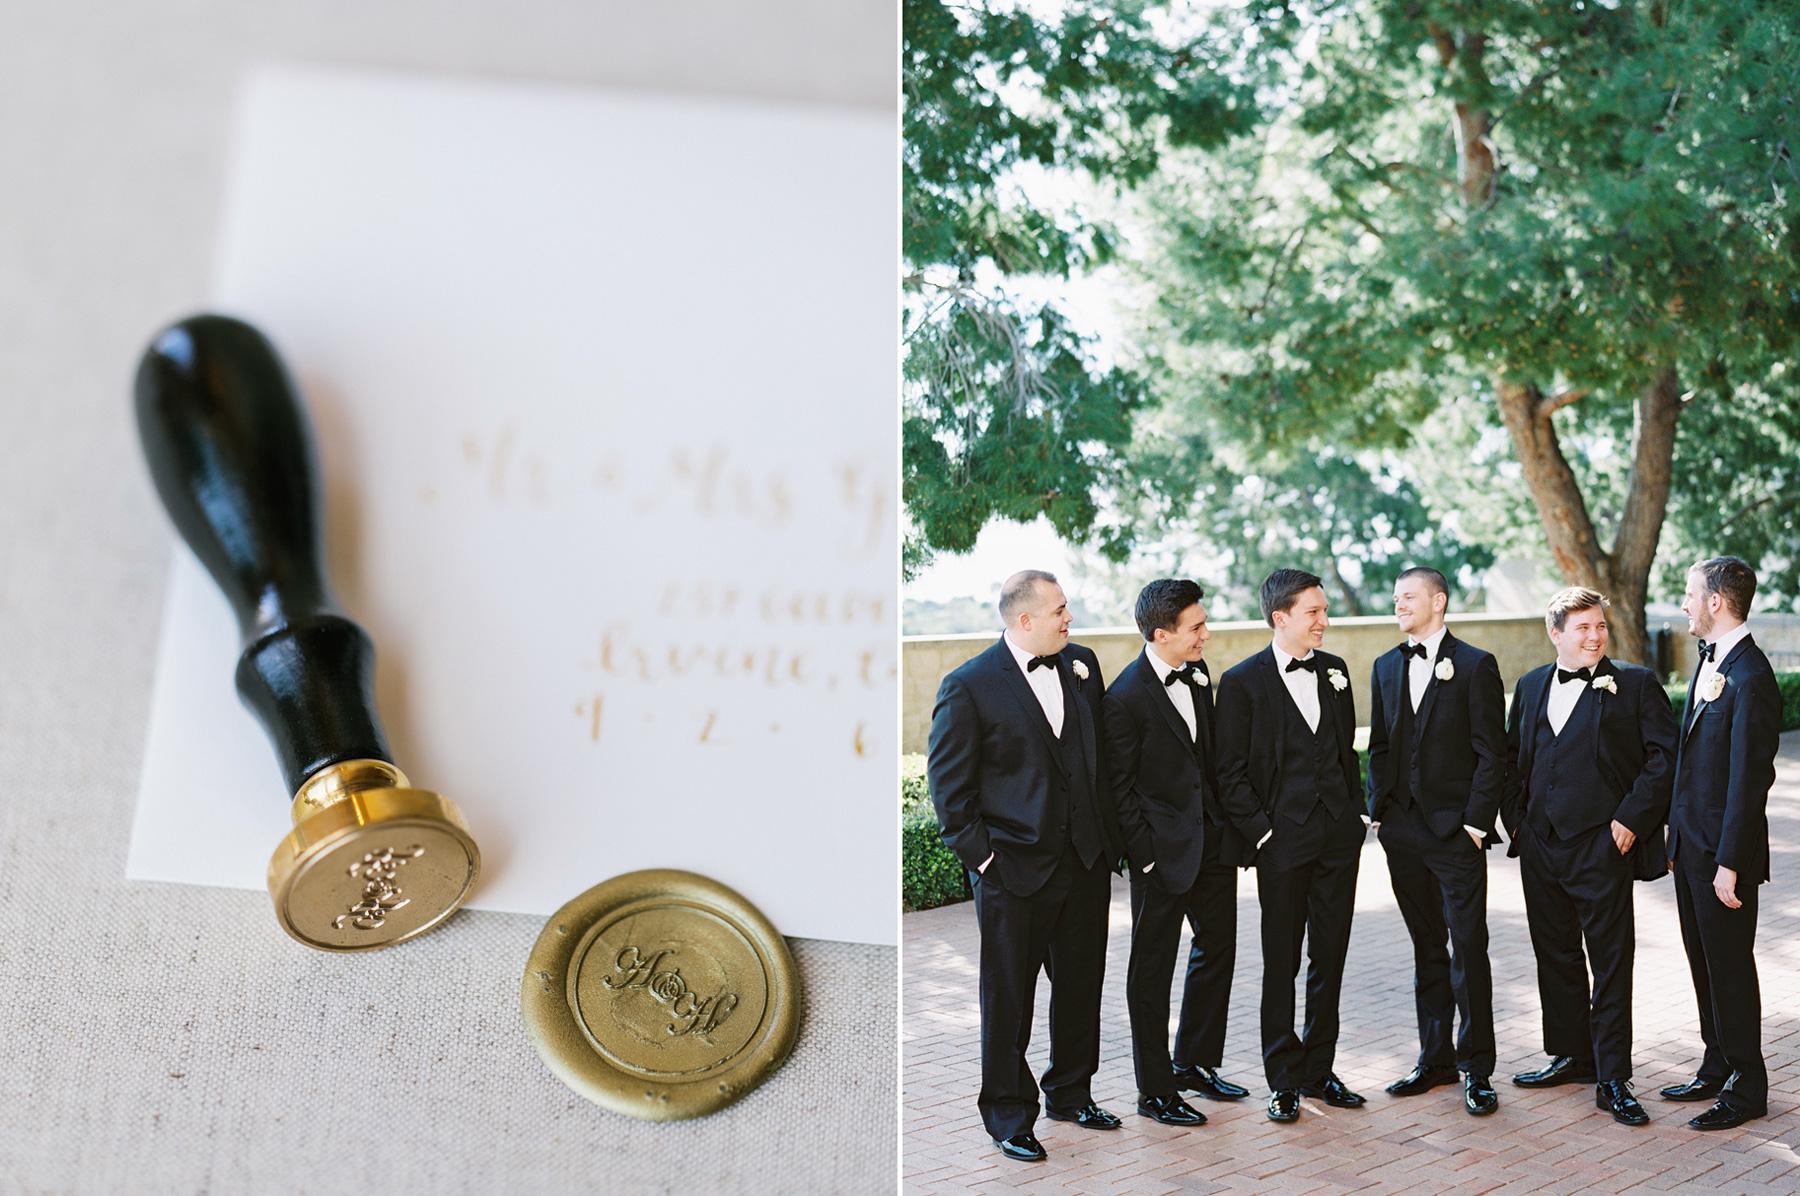 Pelican-hill-wedding-10.JPG